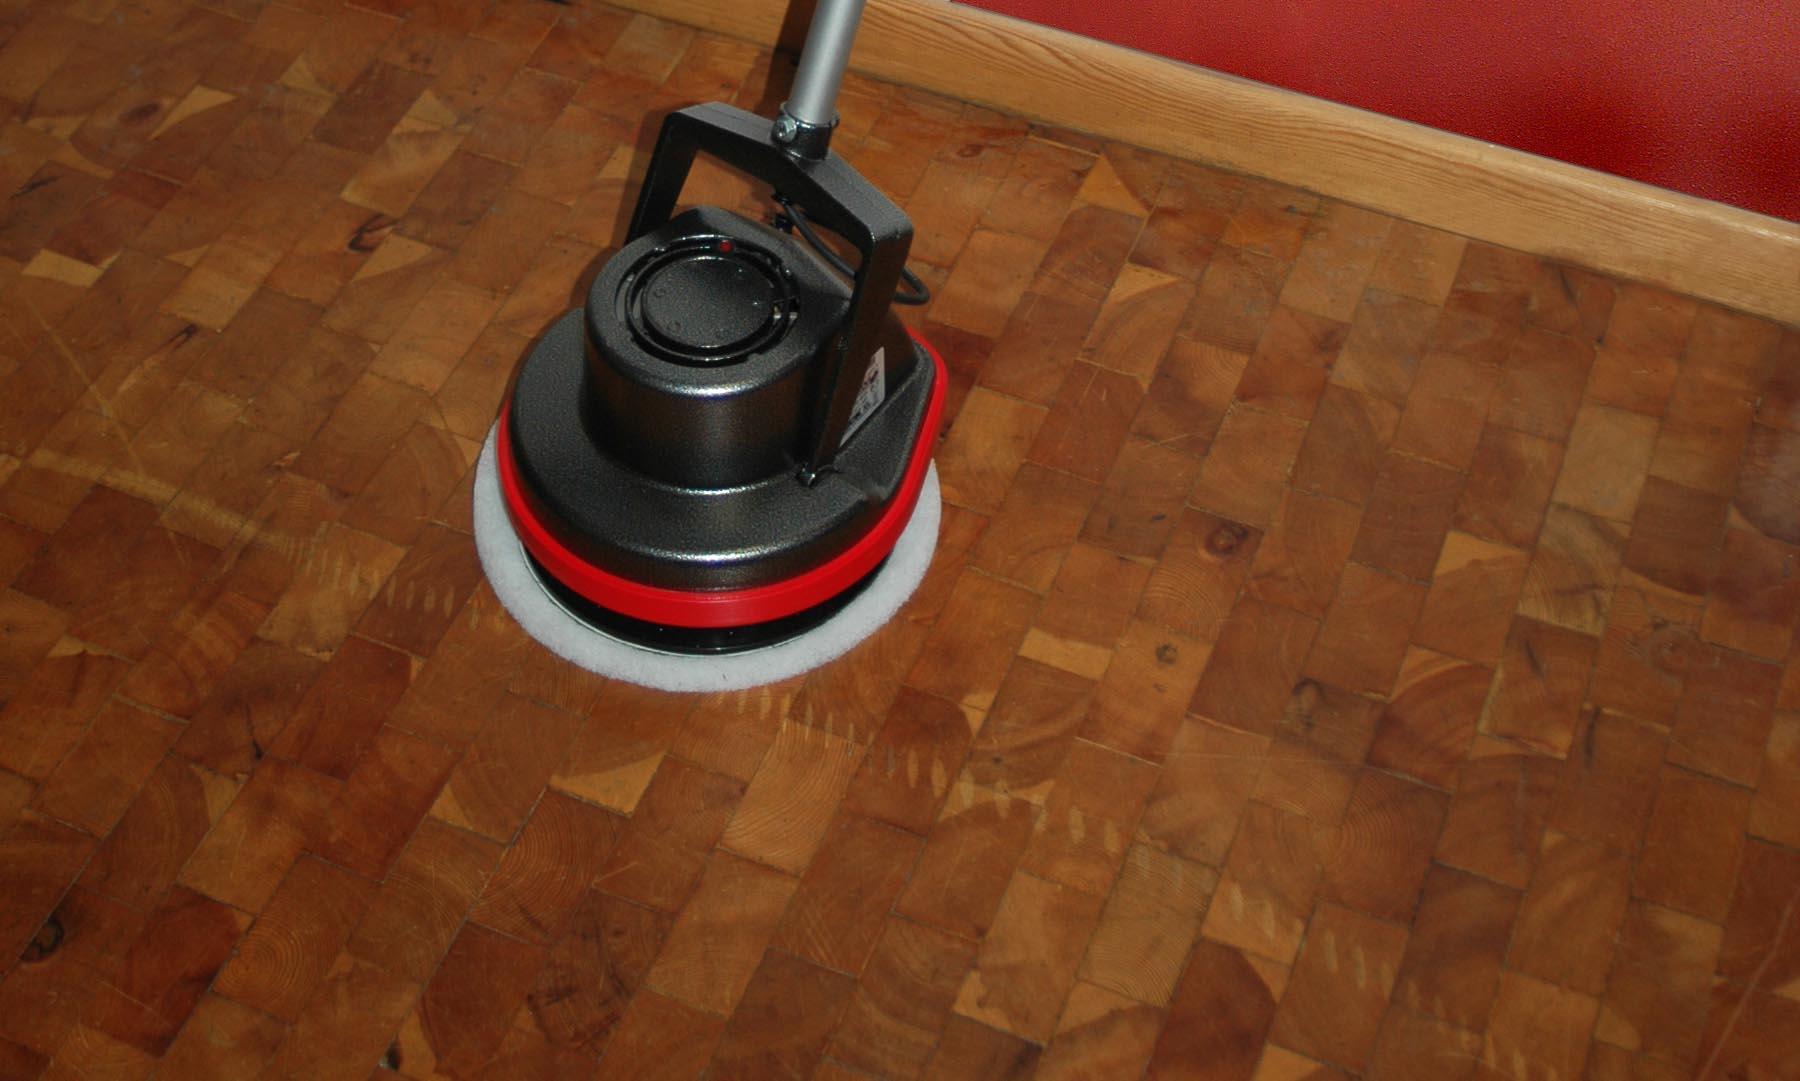 Fußboden Poliermaschine ~ Poliermaschine günstig mieten mietmeile